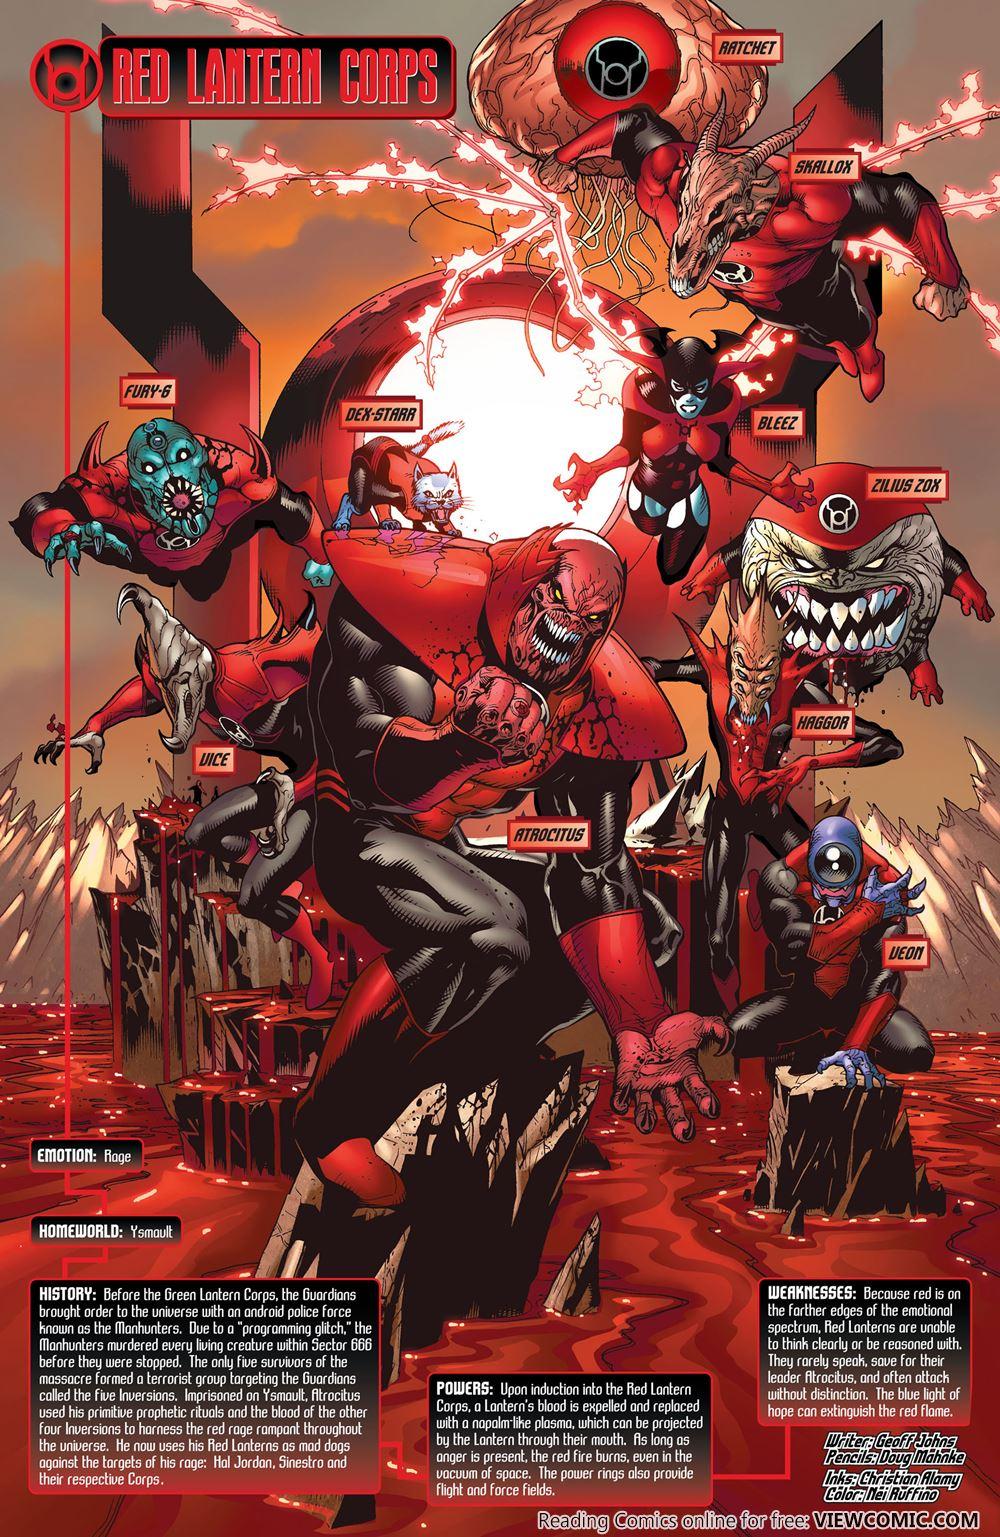 Blackest Night: Tales of the Corps 1 (DC Comics